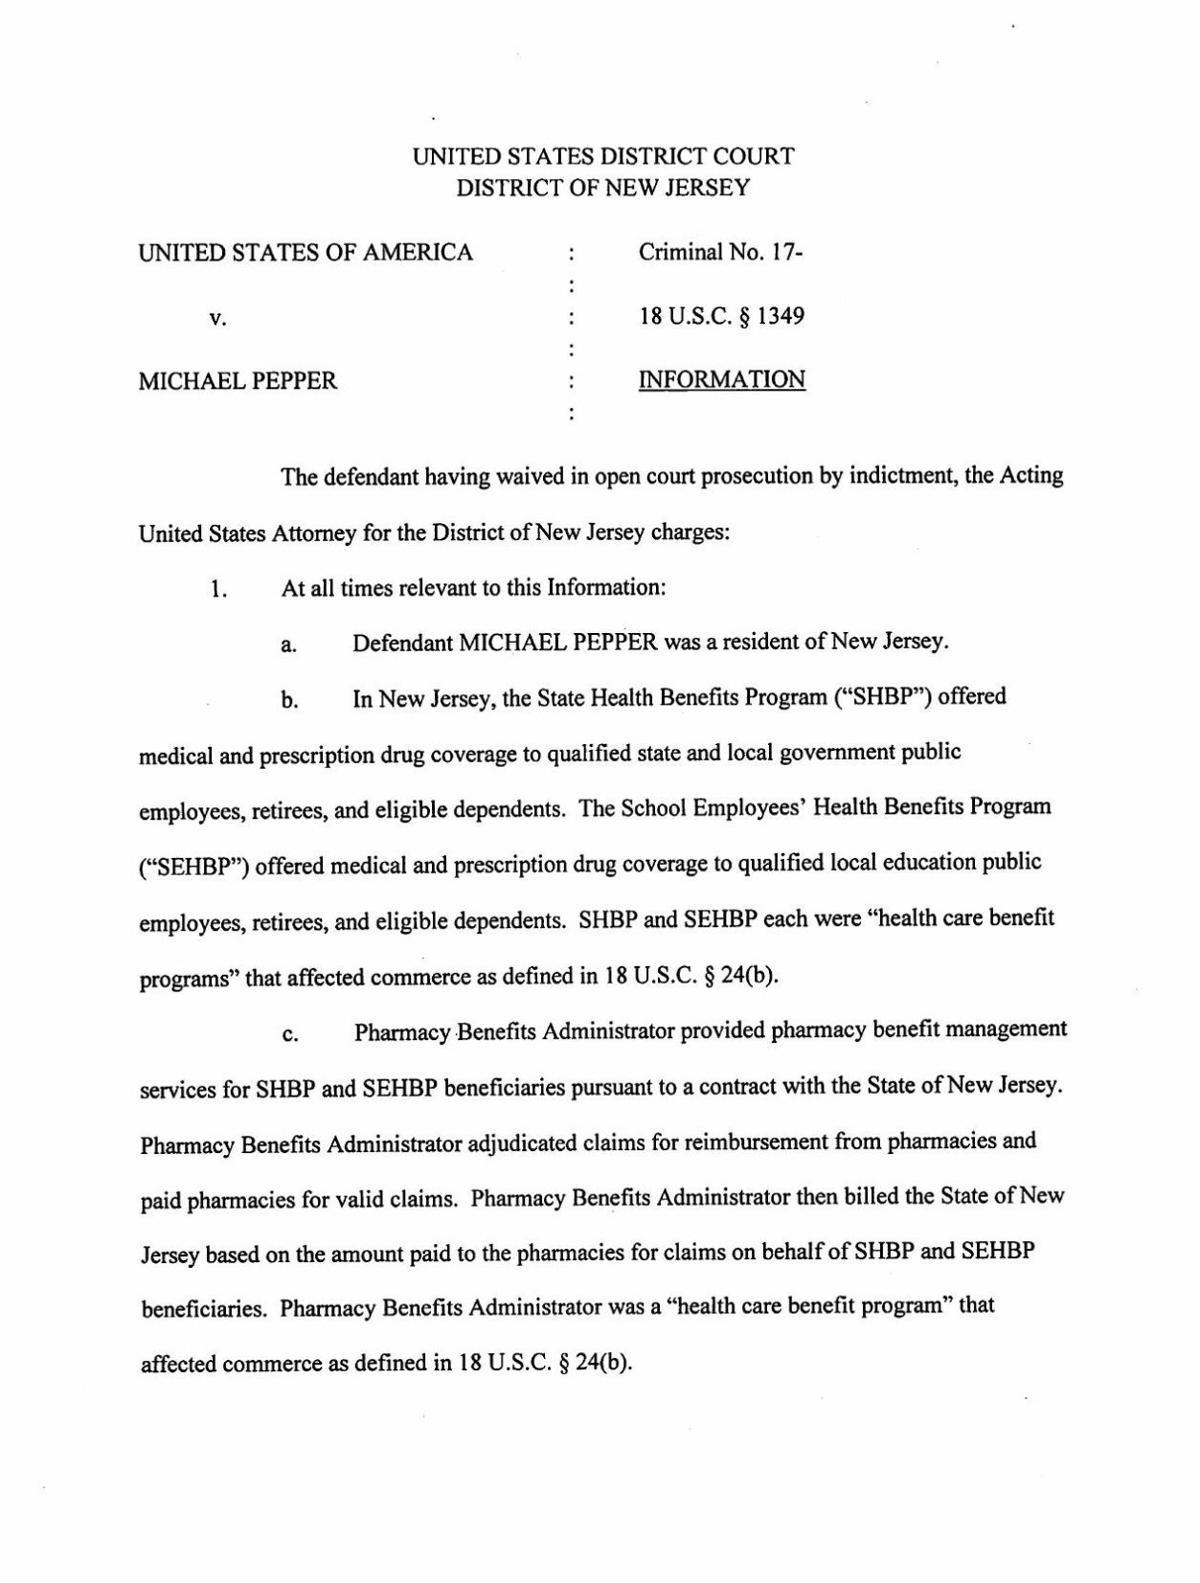 Michael Pepper court documents